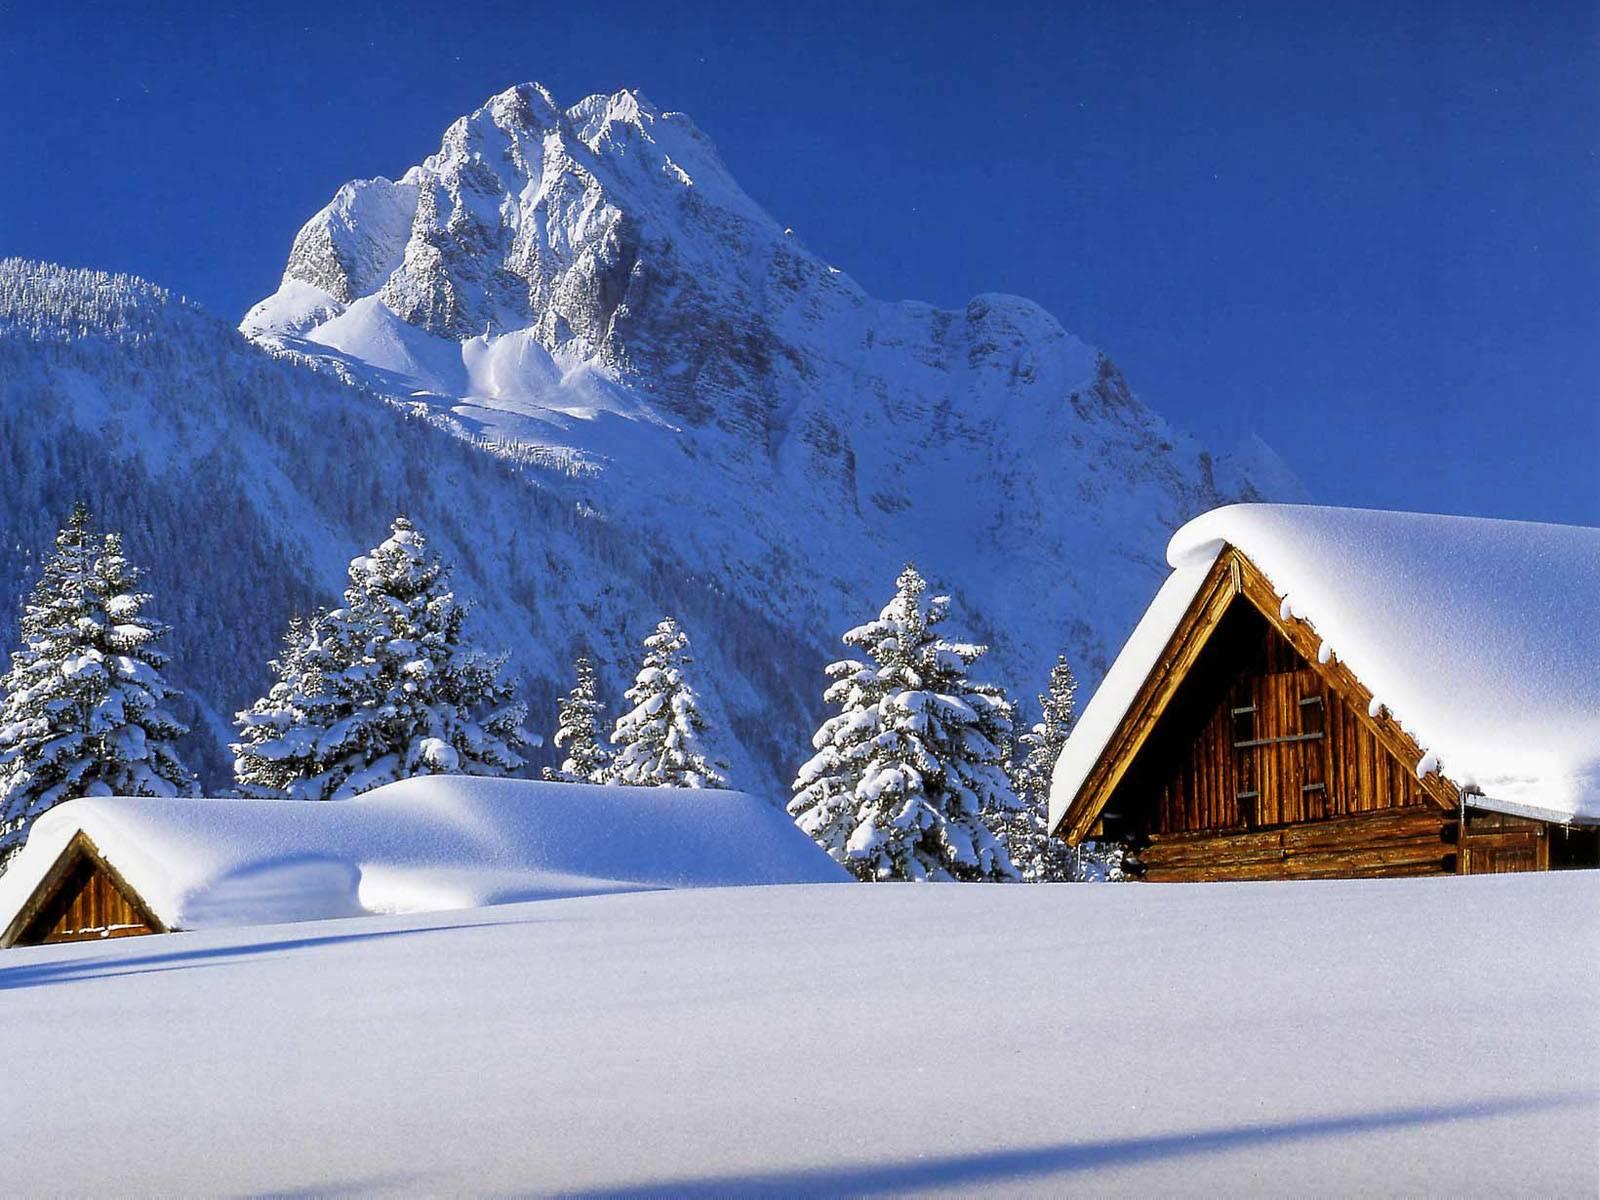 HD Free Wallpaper Winter Scene - WallpaperSafari